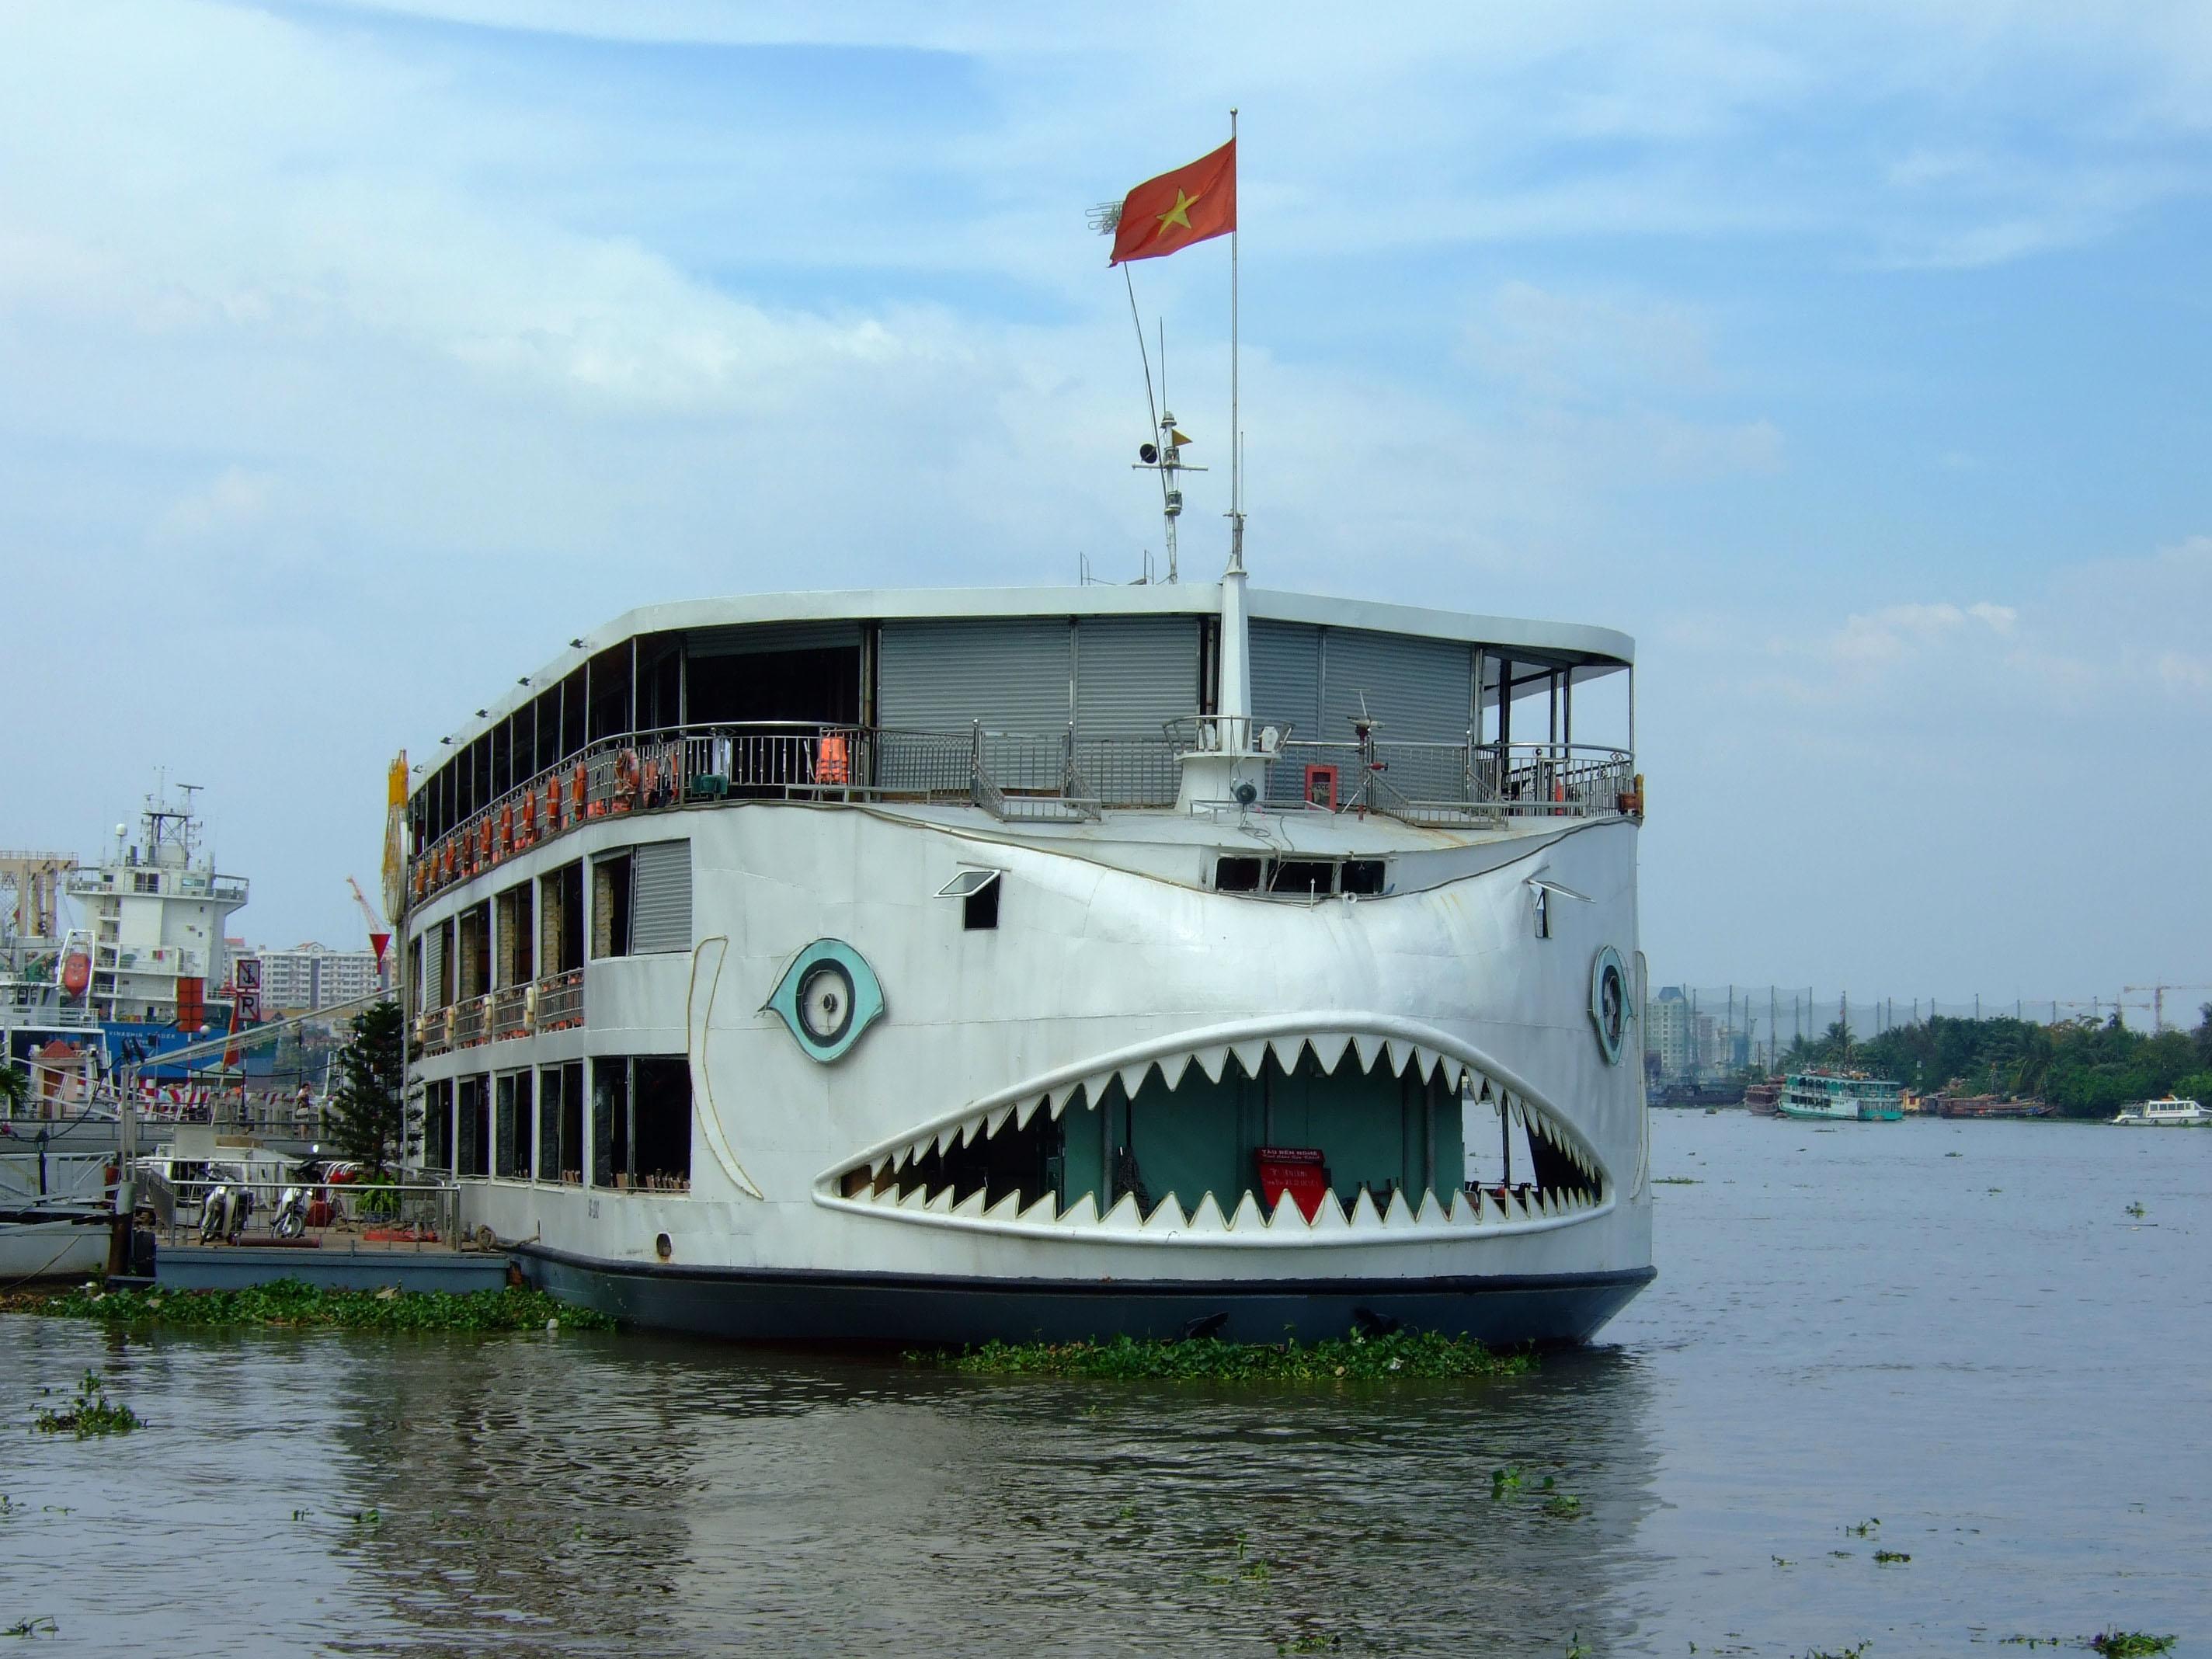 Vietnam Ho Chi Minh City Saigon harbor Ferries boats Feb 2009 38